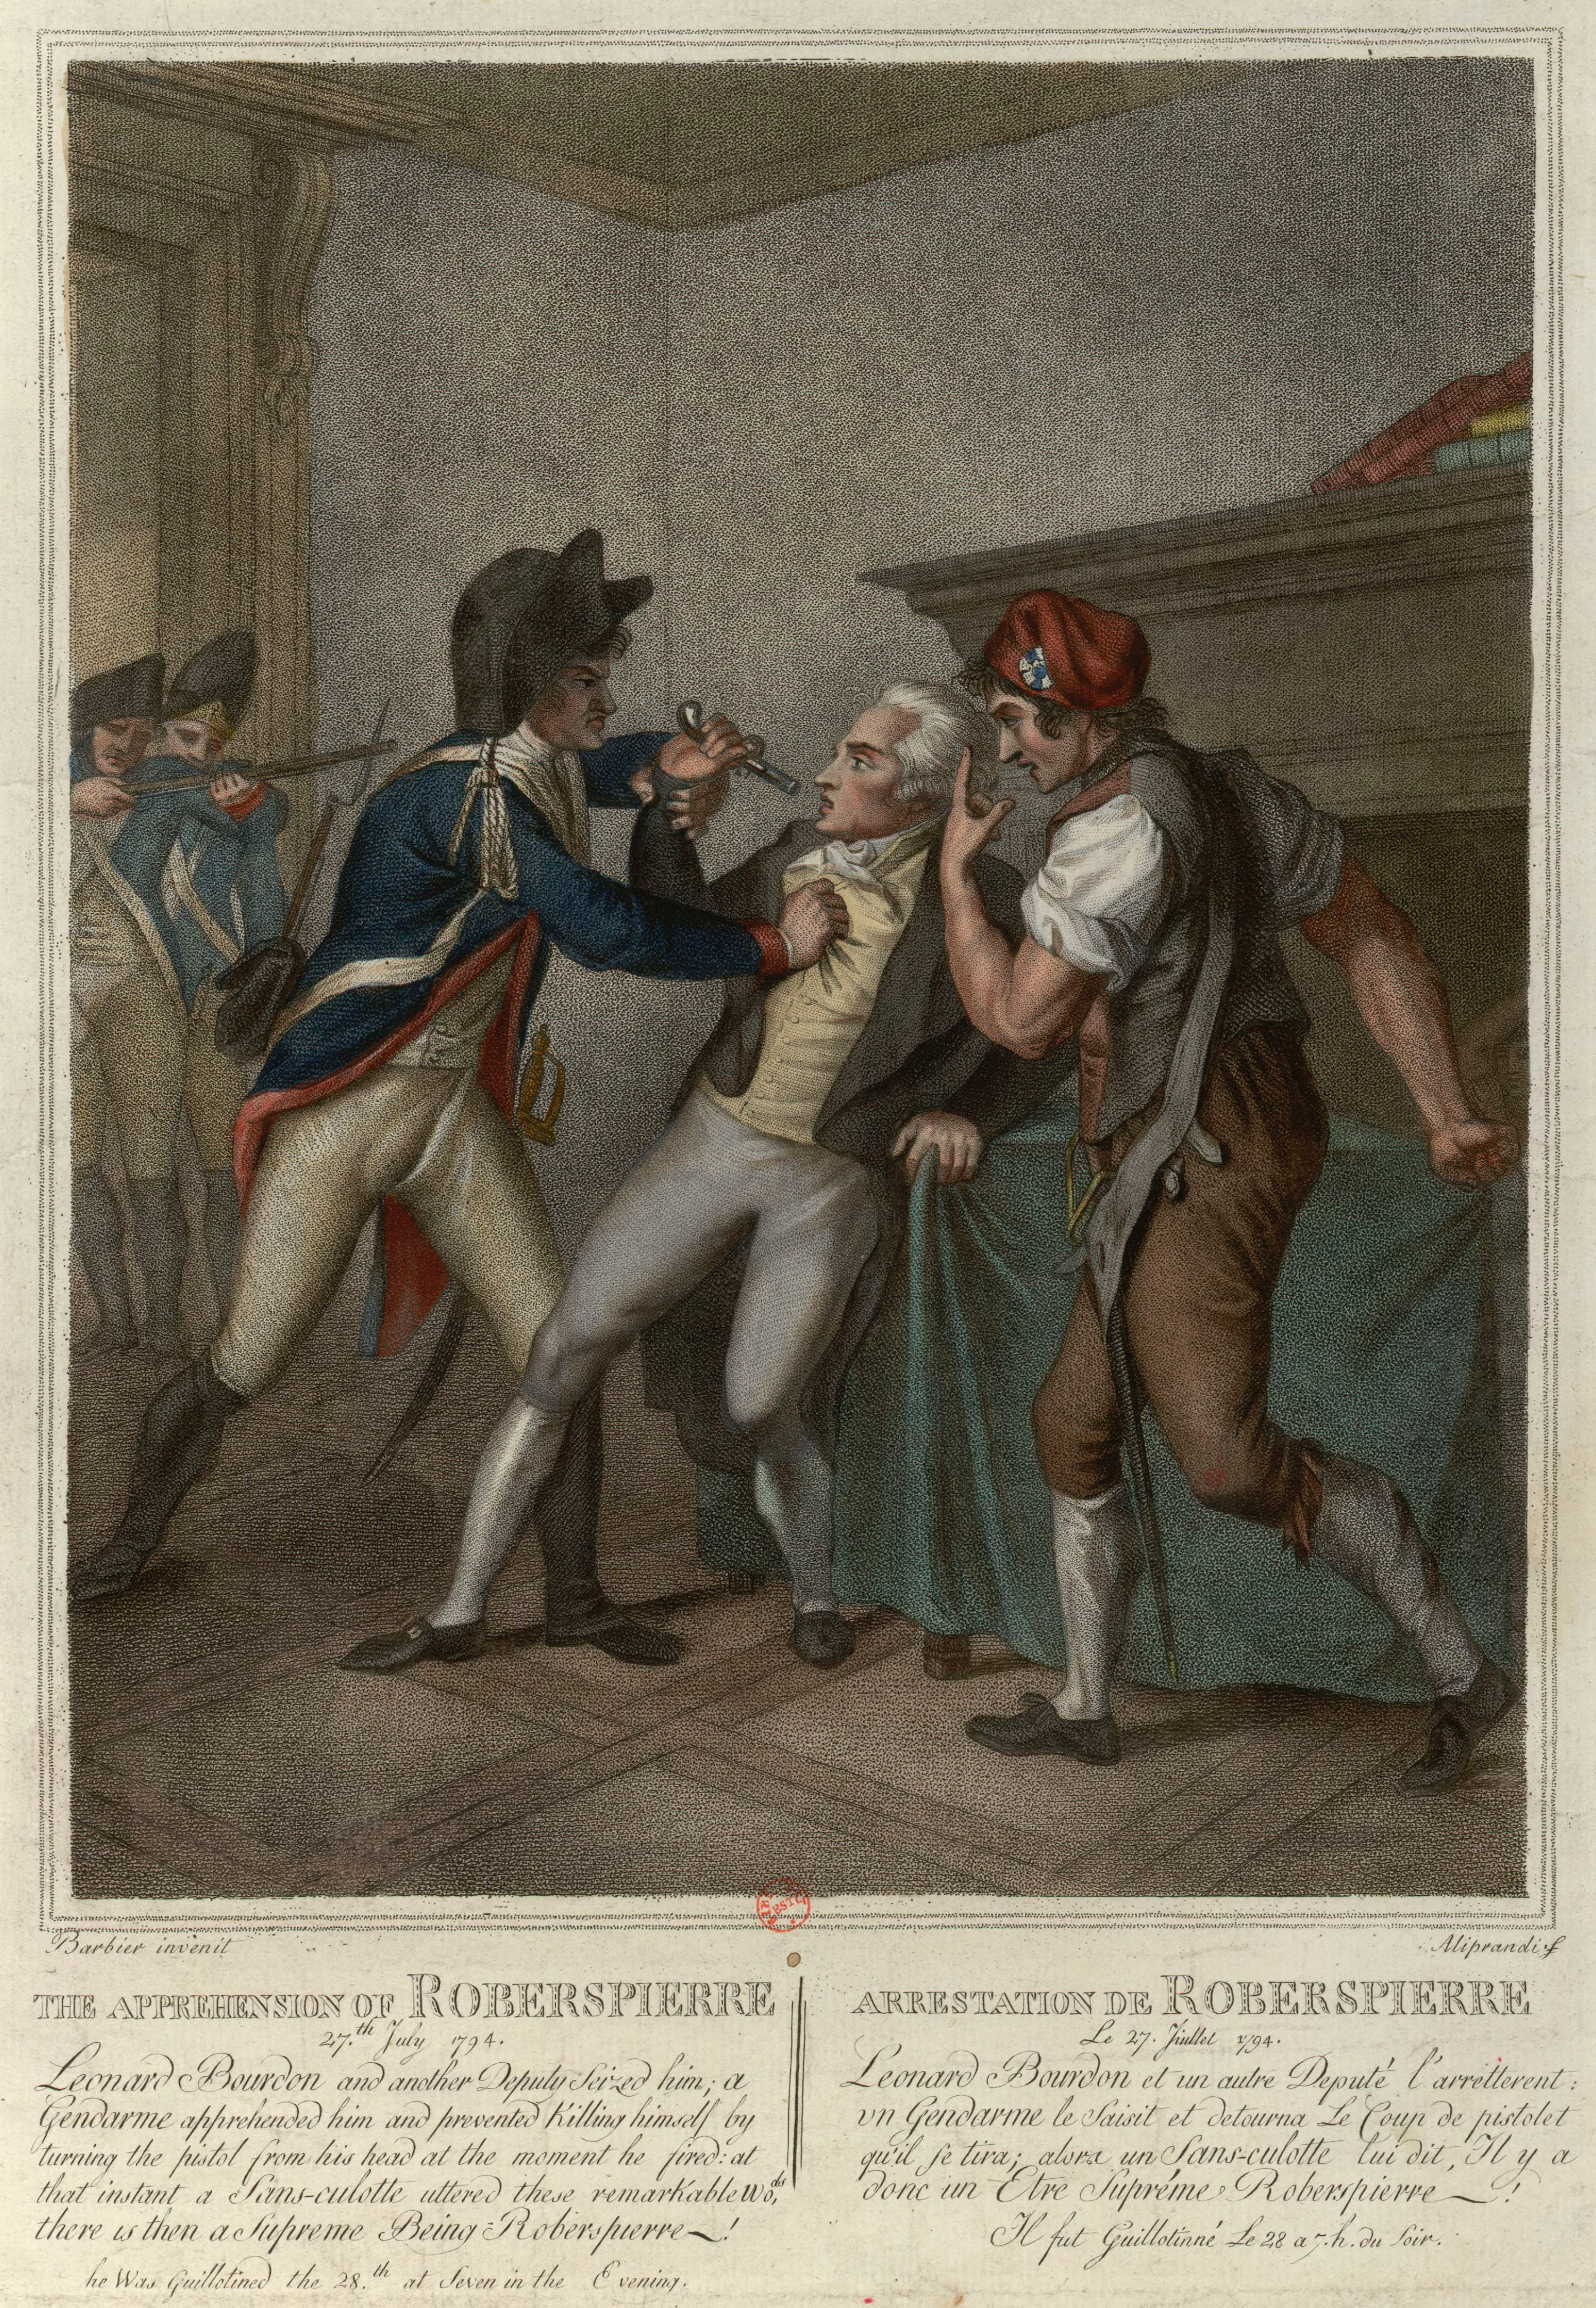 Fichier:Arrestation de Robespierre.jpg